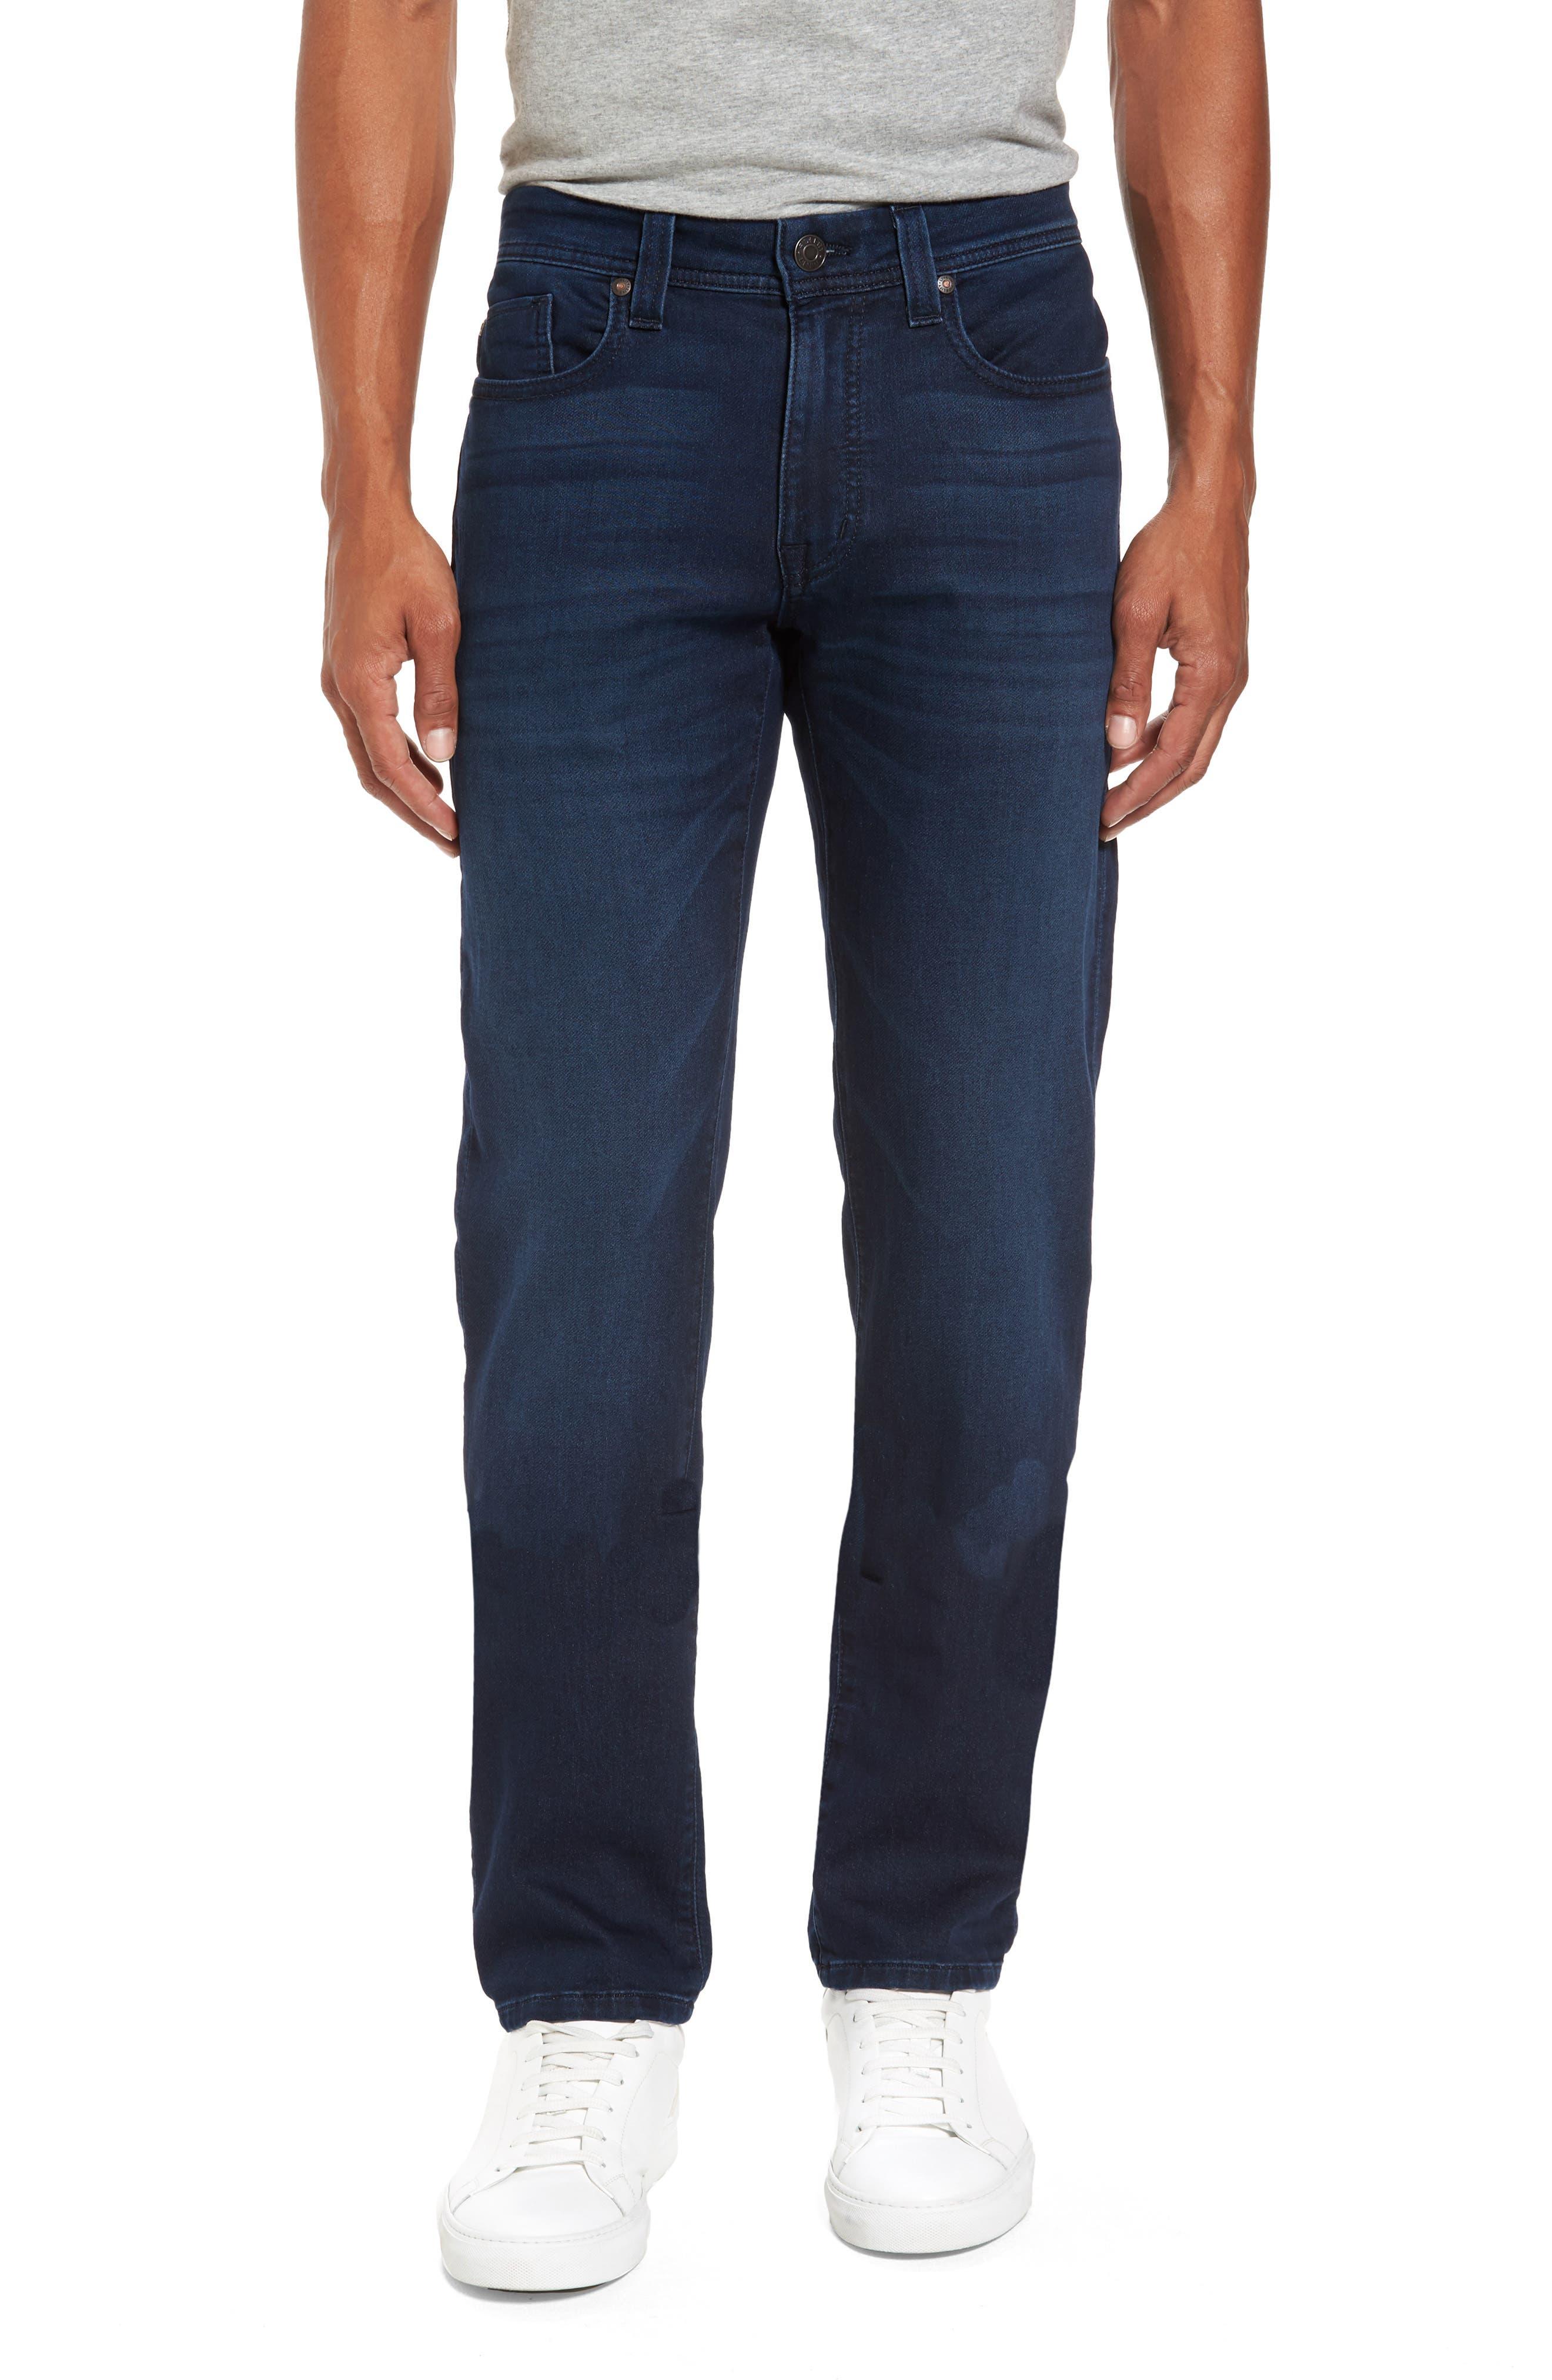 FIDELITY DENIM, Jimmy Slim Straight Leg Jeans, Main thumbnail 1, color, 400